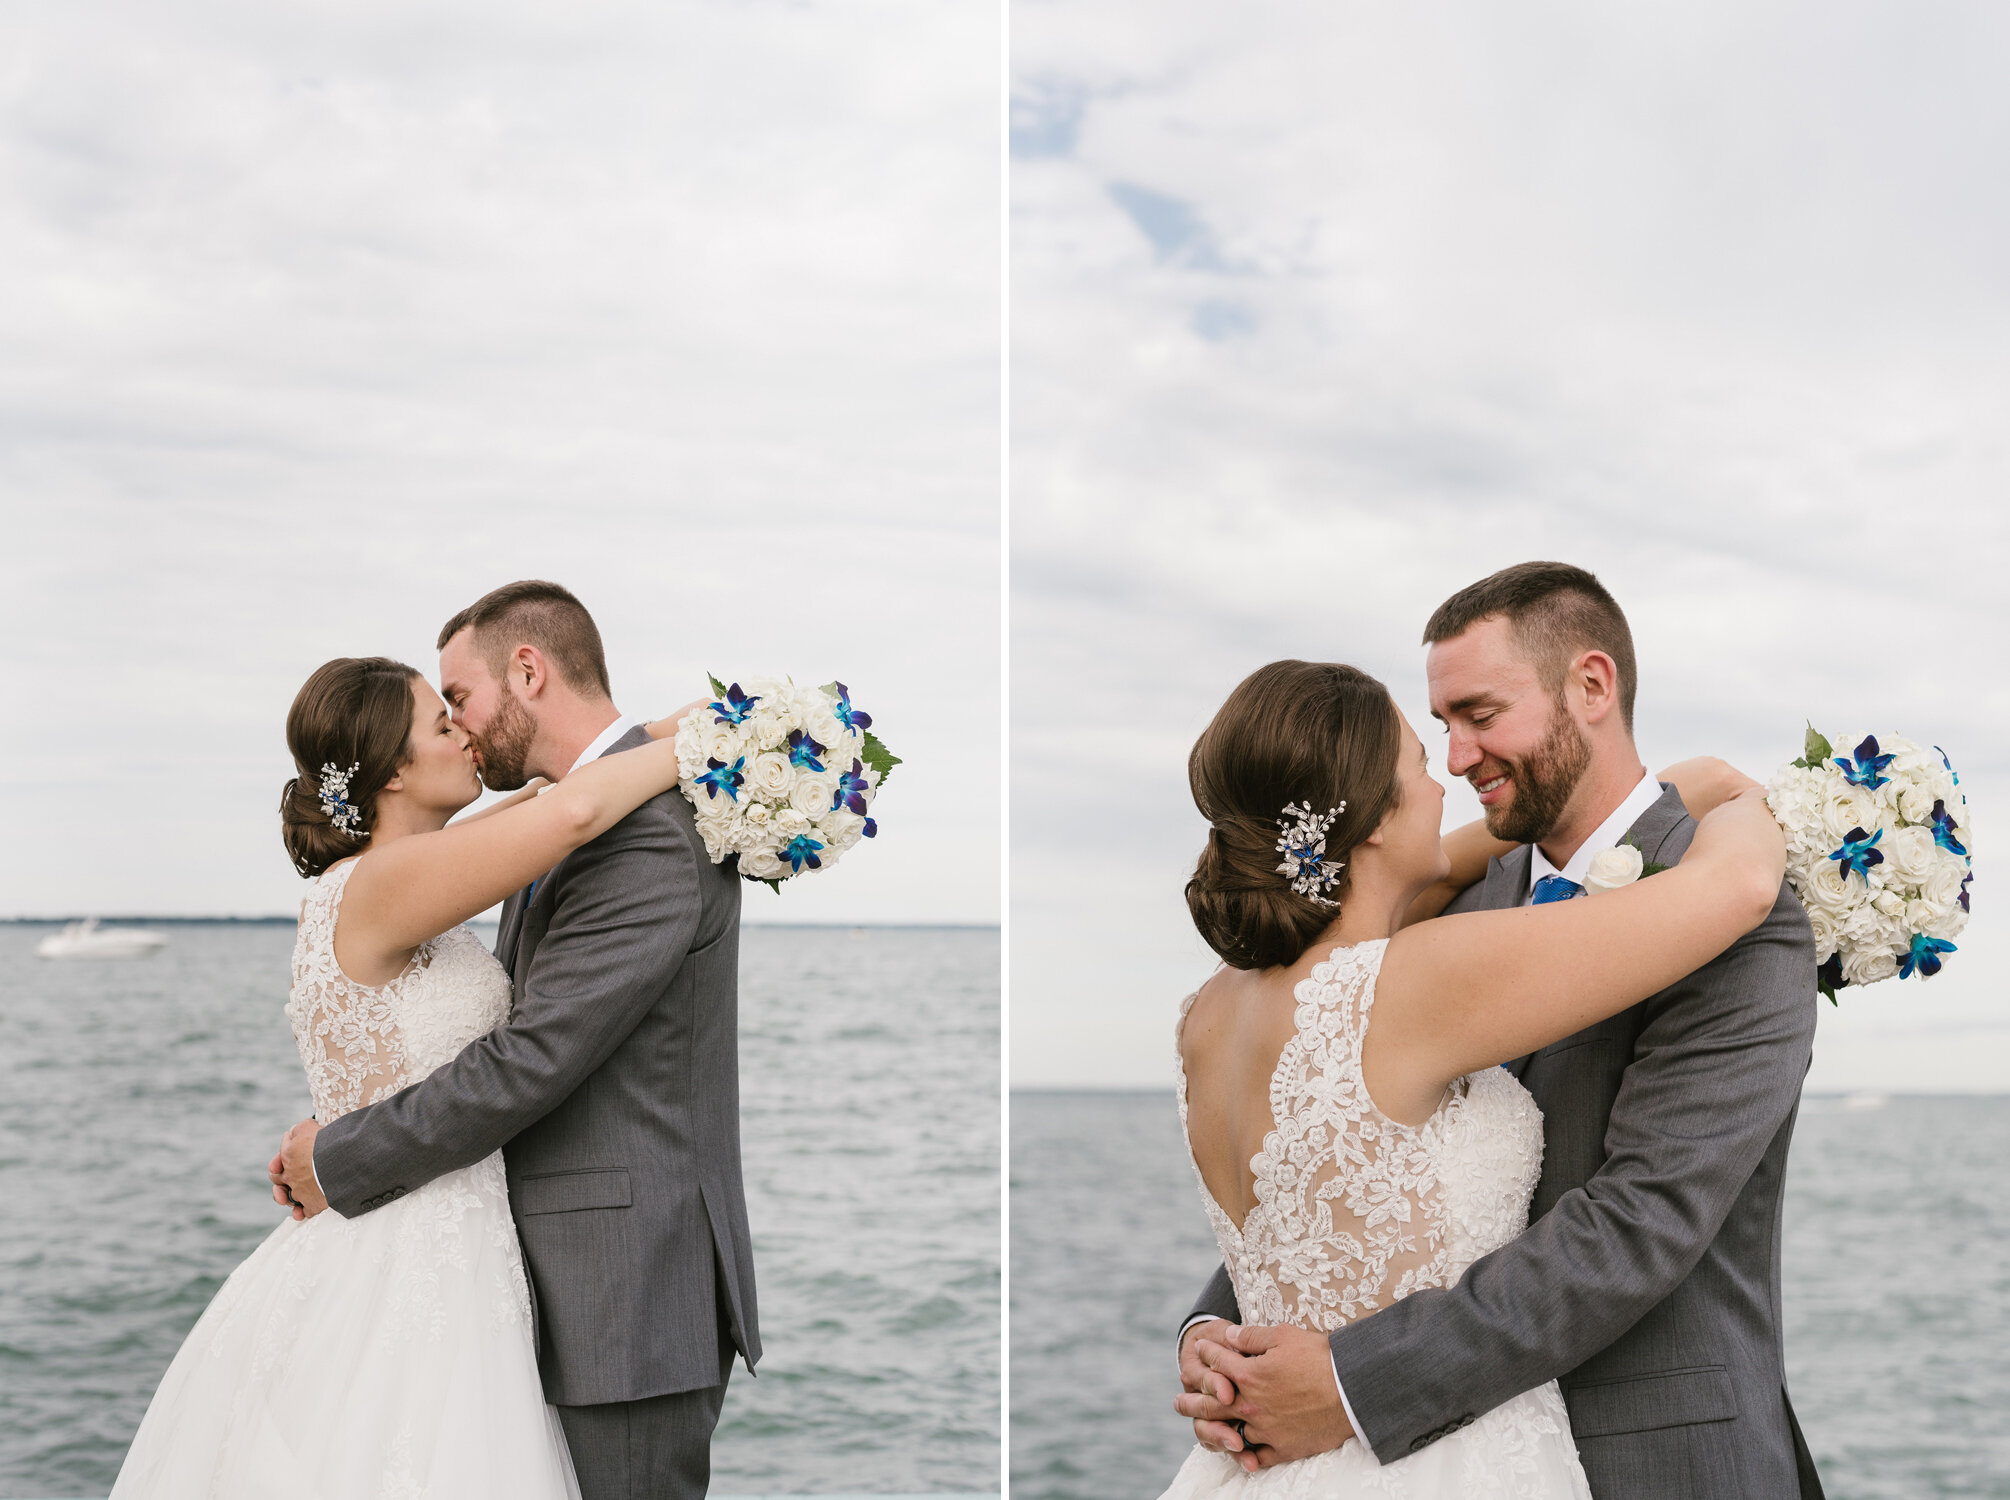 st-clair-shores-wedding-macray-harbor (63).jpg